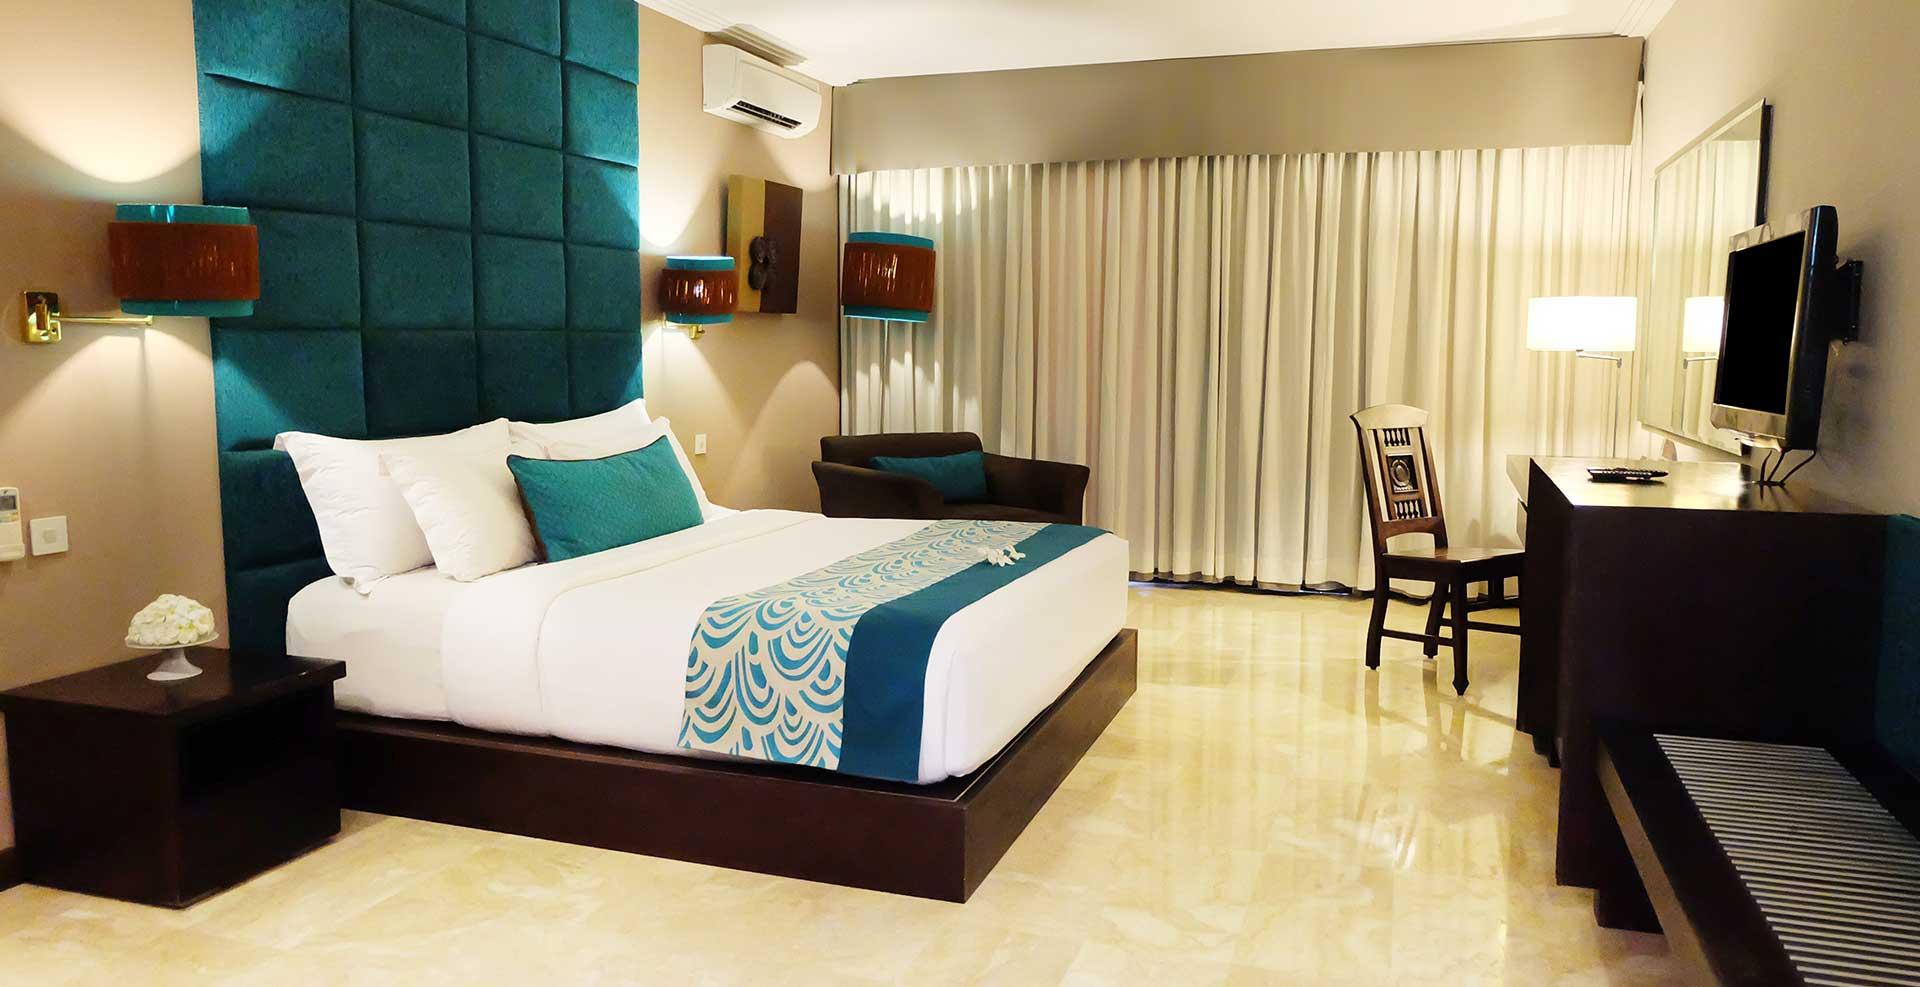 هتل وایت رز کوتا ریزورت بالی